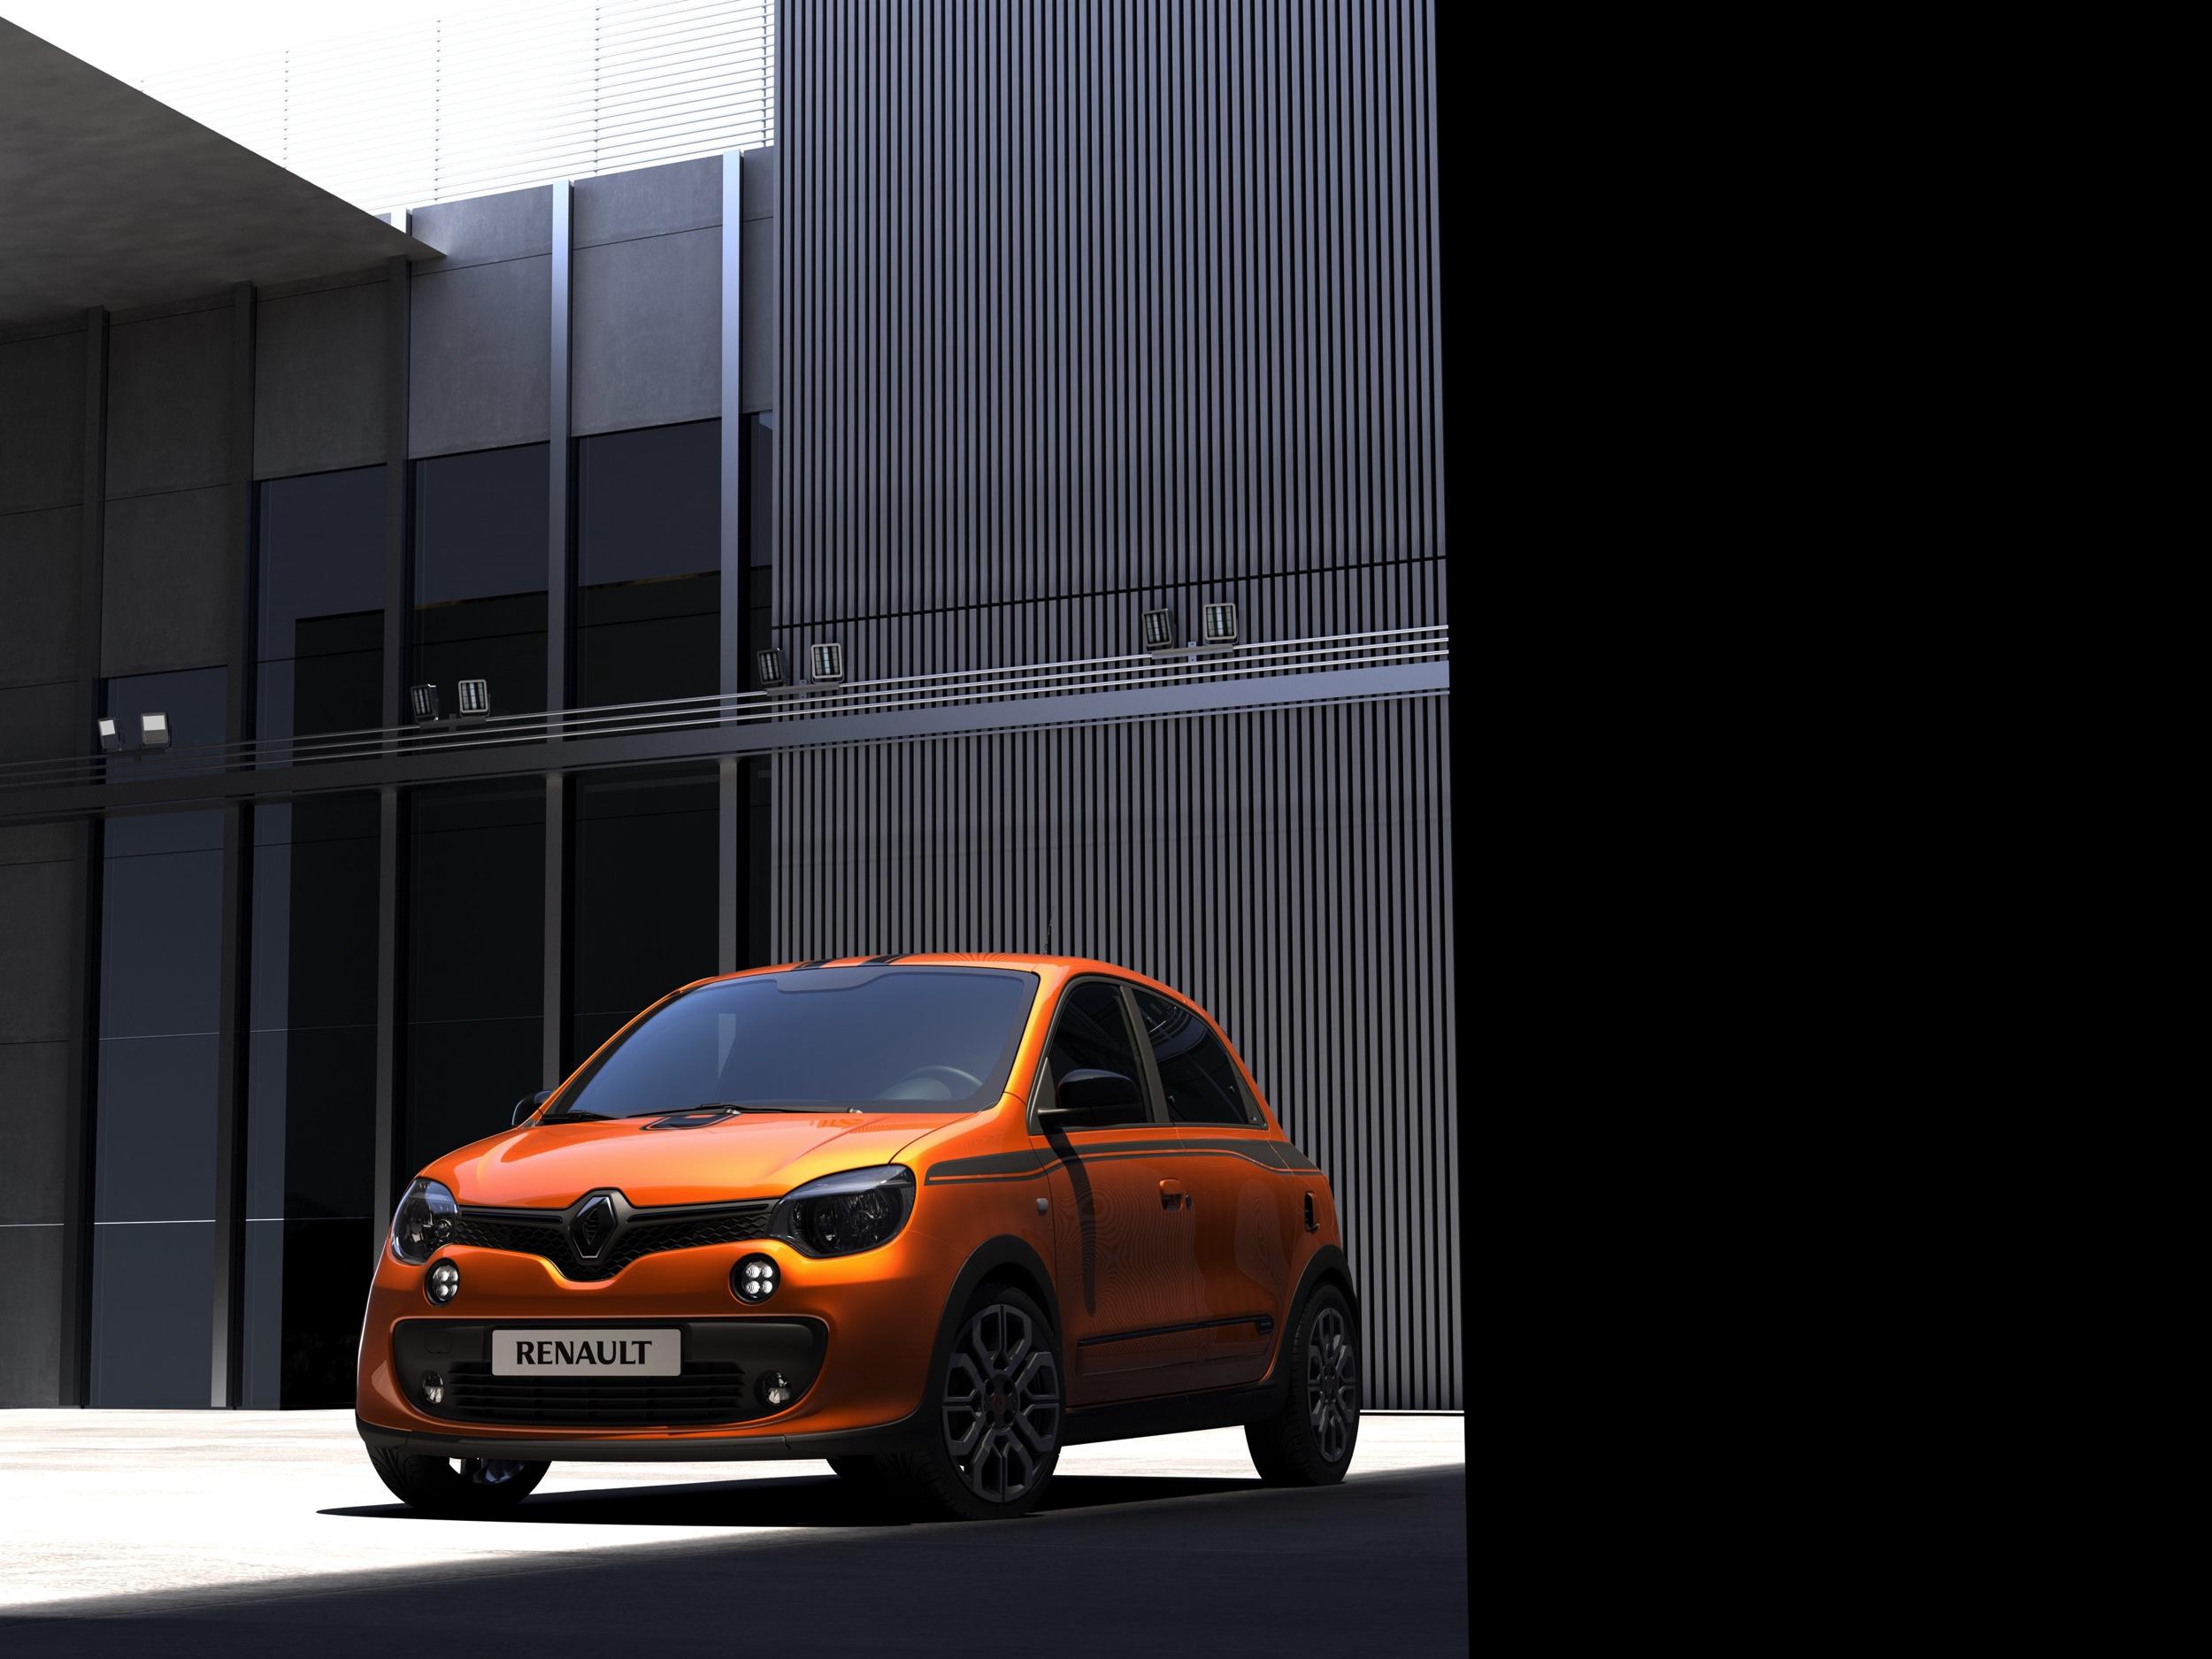 Renault Twingo GT -13- Autovisie.nl